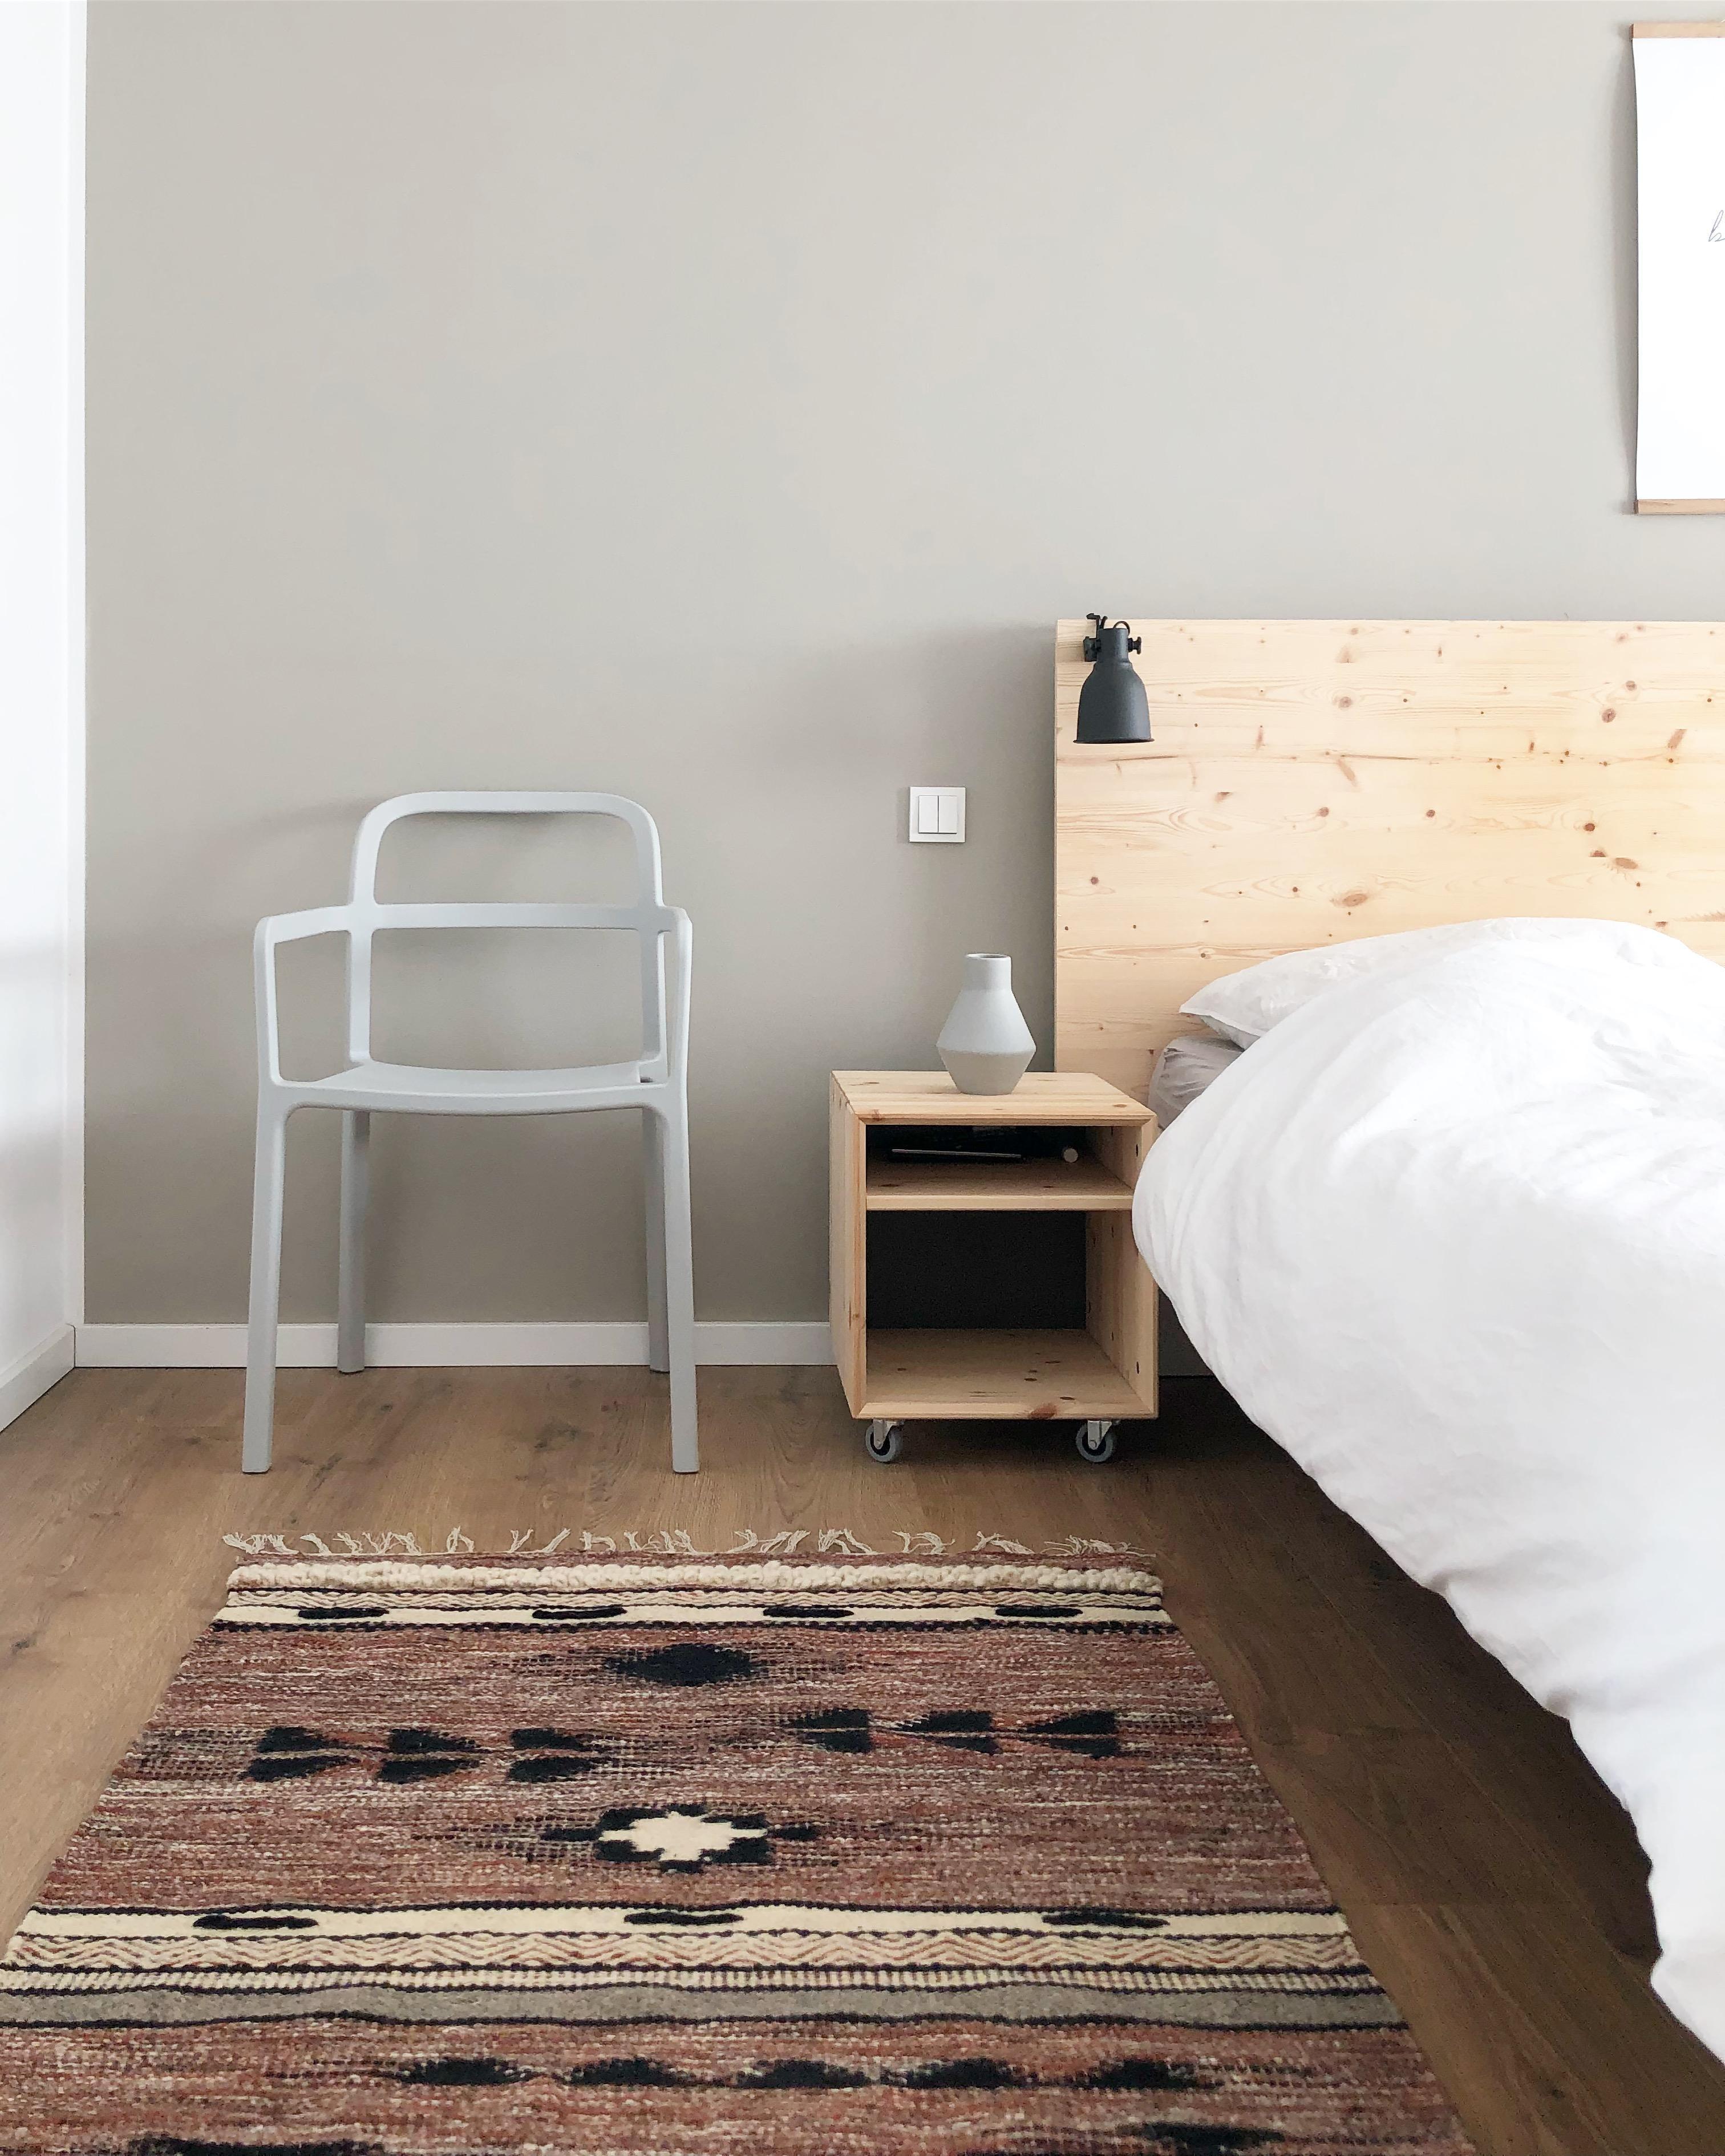 Schlafzimmer ideen altrosa - Altrosa schlafzimmer ...